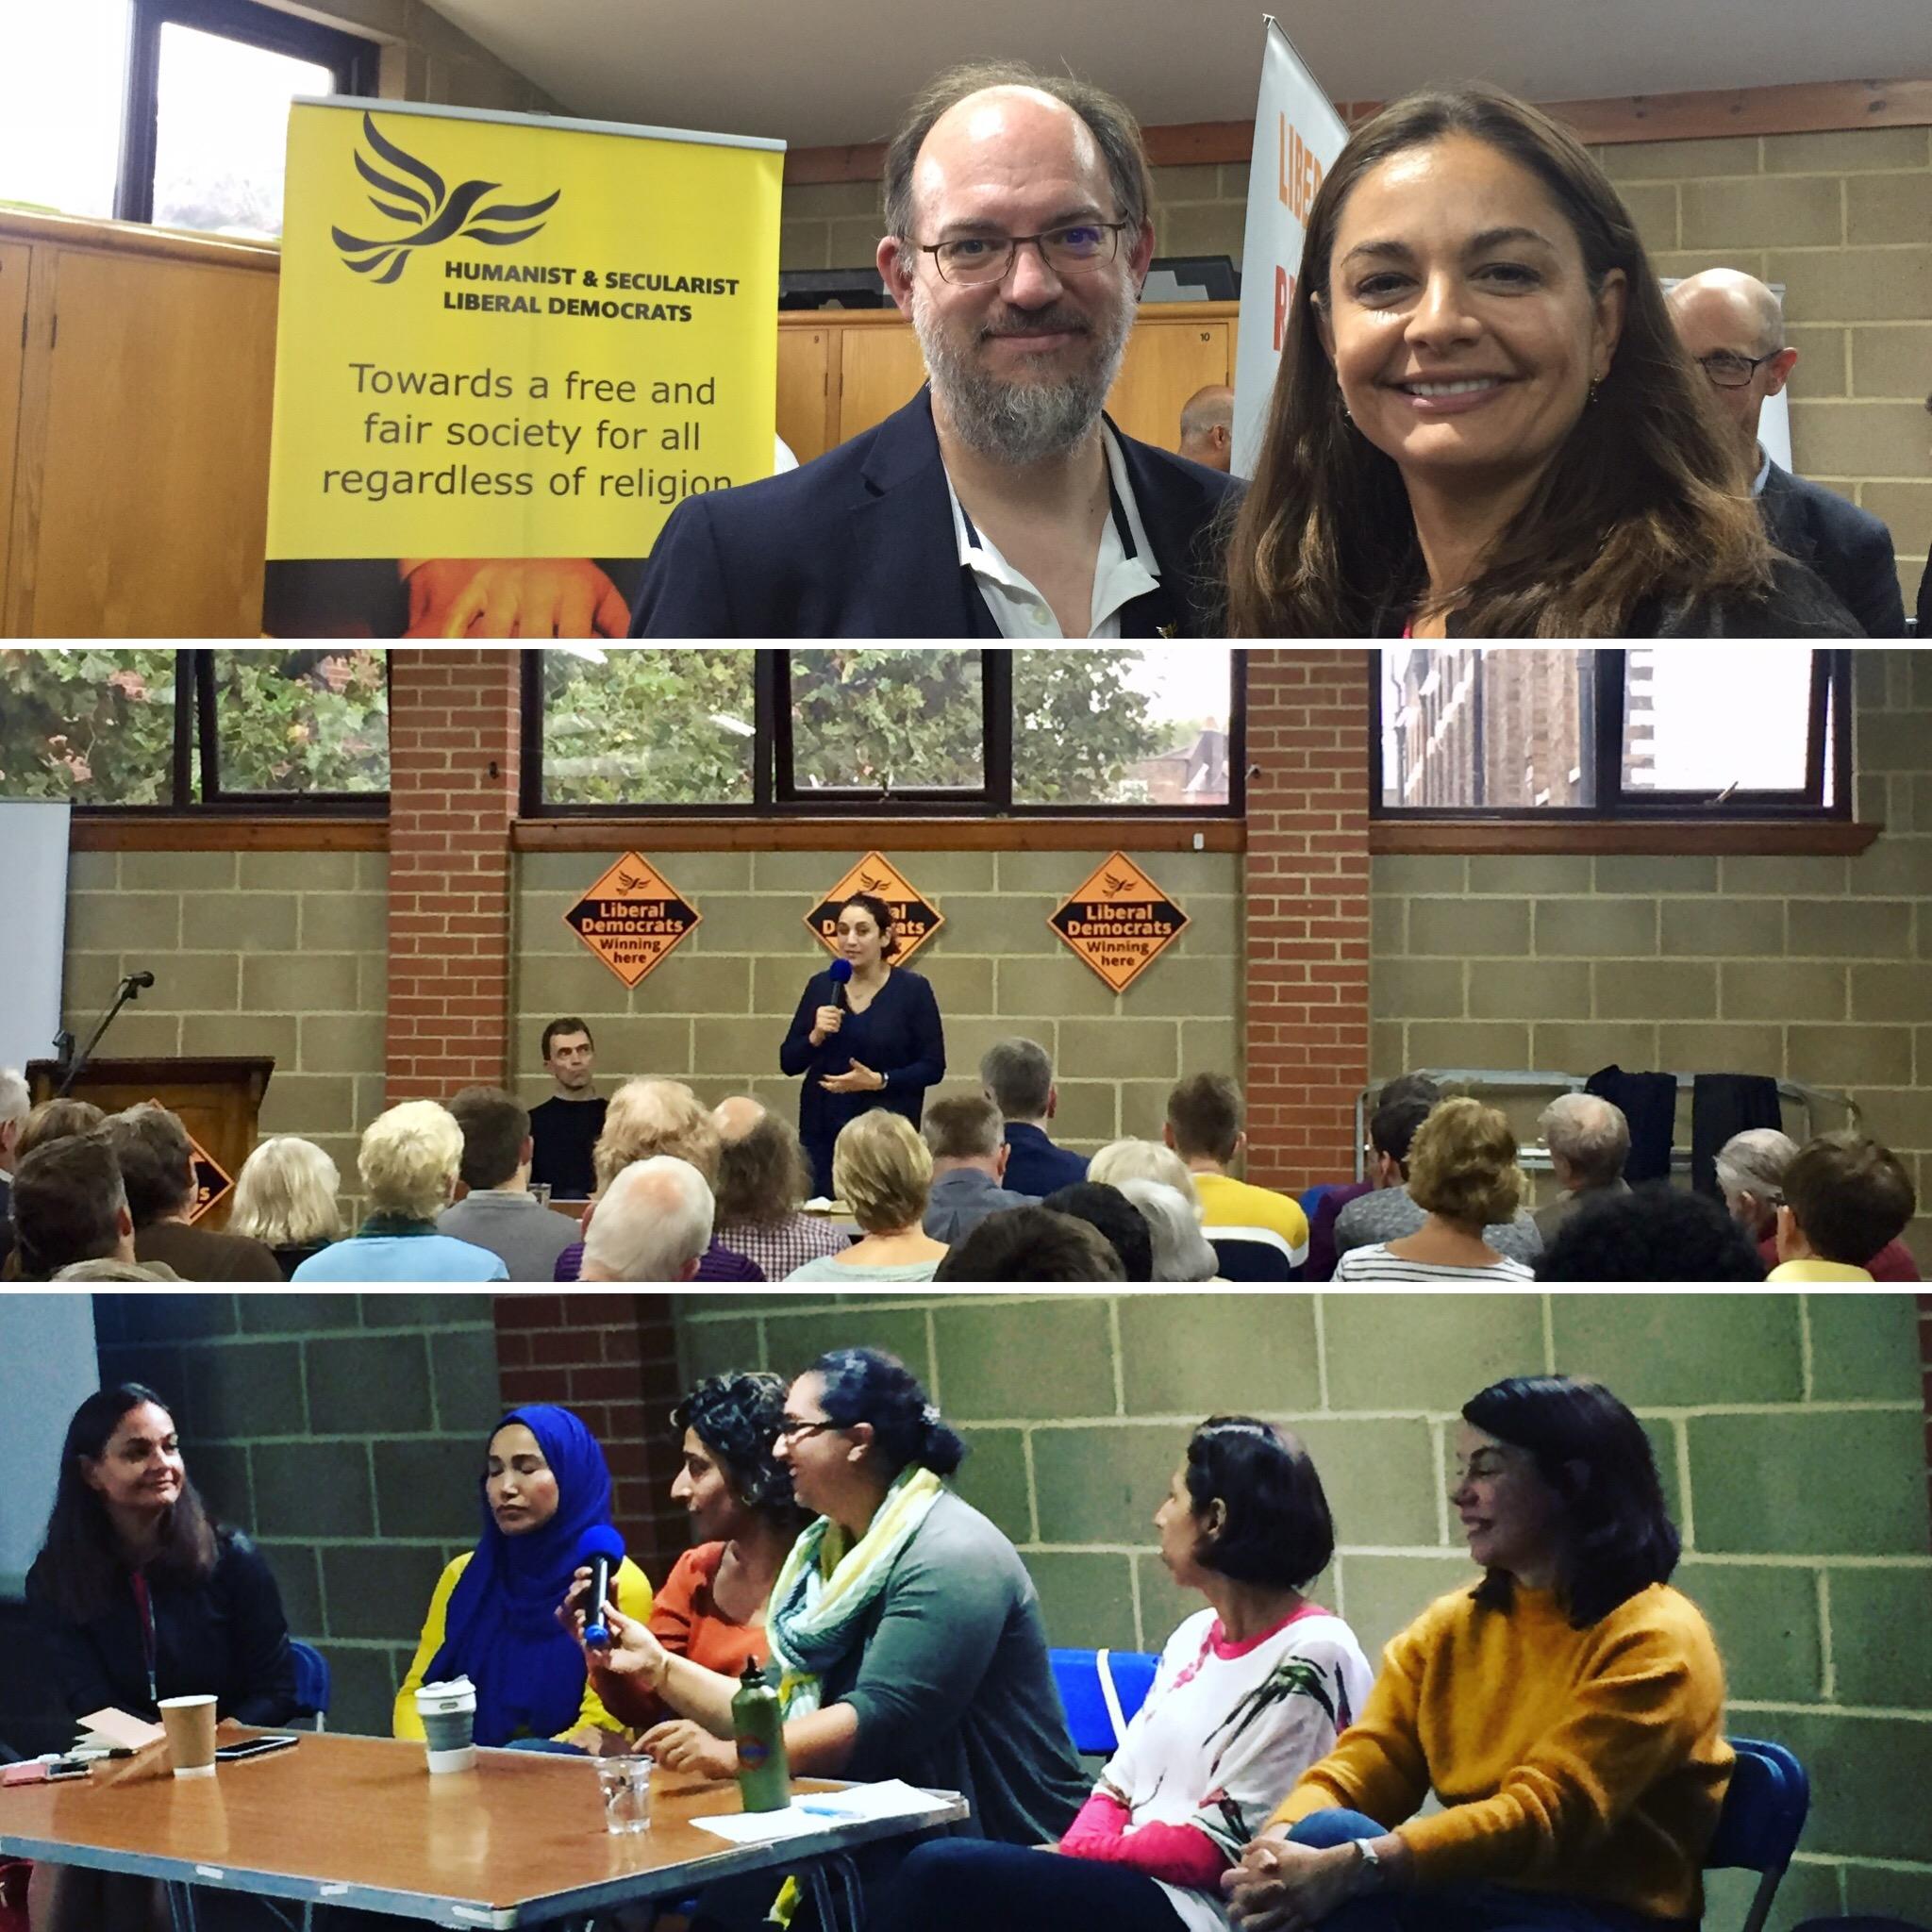 Liberal Democrats London Conference